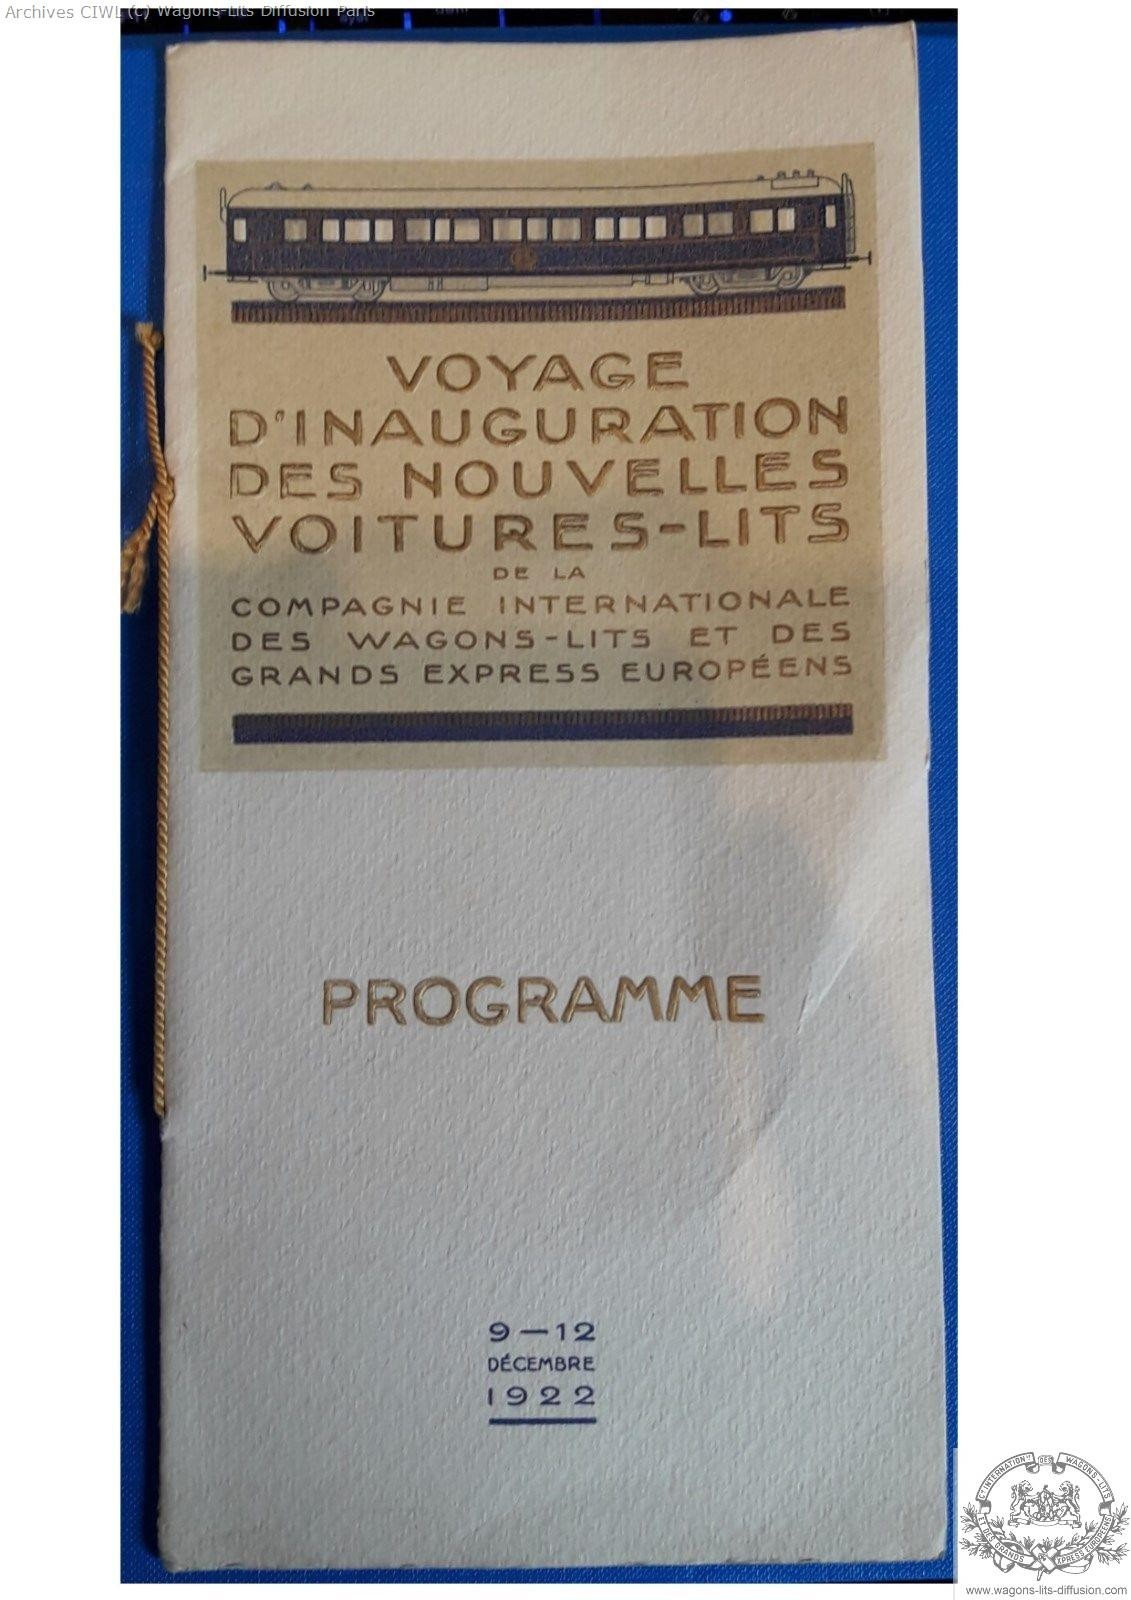 Wl leaflet inauguration new wl 1922 1